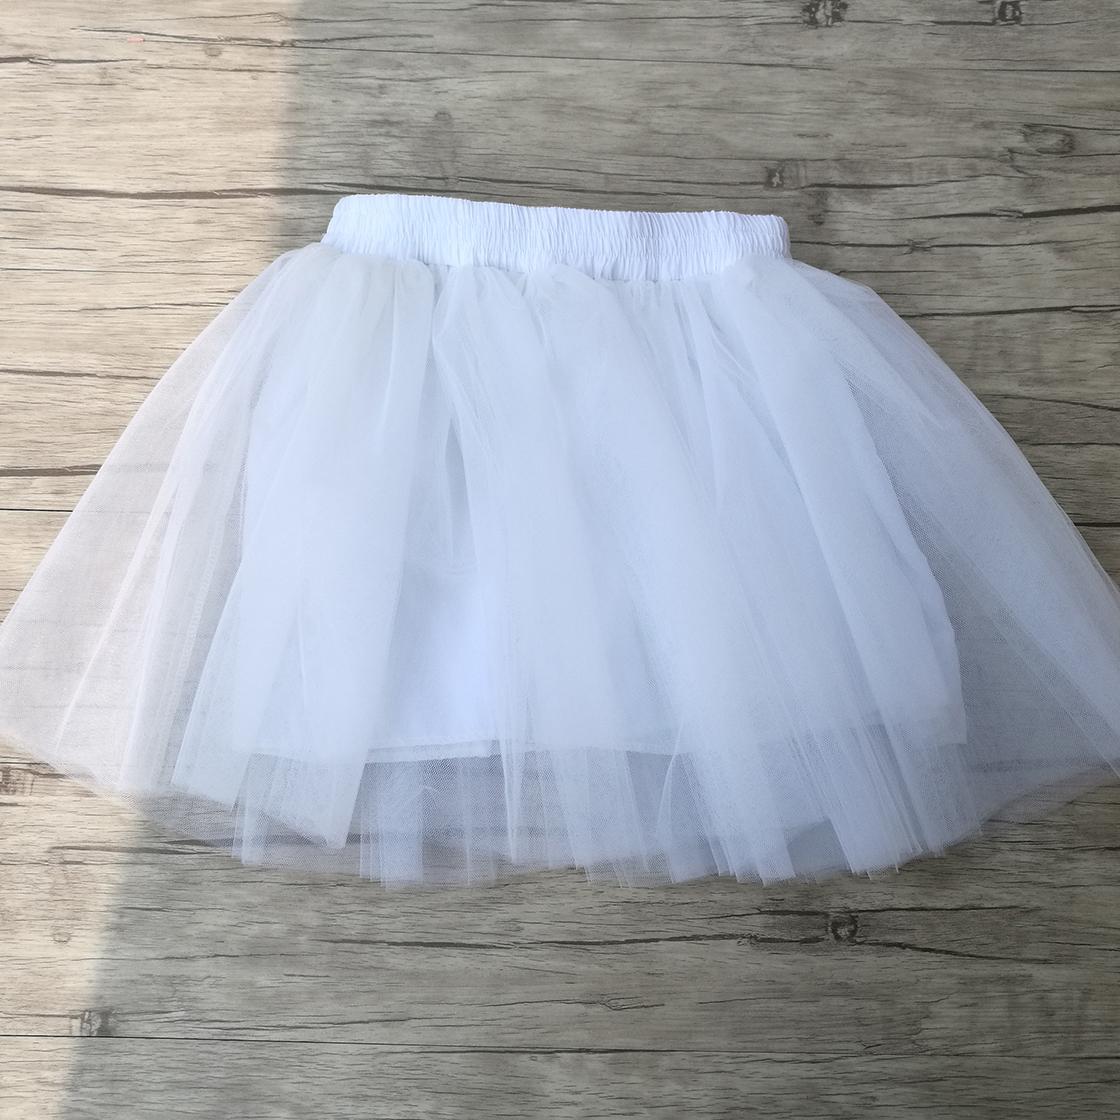 Summer Womens Mini Tulle Skirt Fairy Style Custom Made 5 layers saia Voile Bouffant Puffy Fashion Skirt Summer Tutu Skirts 1